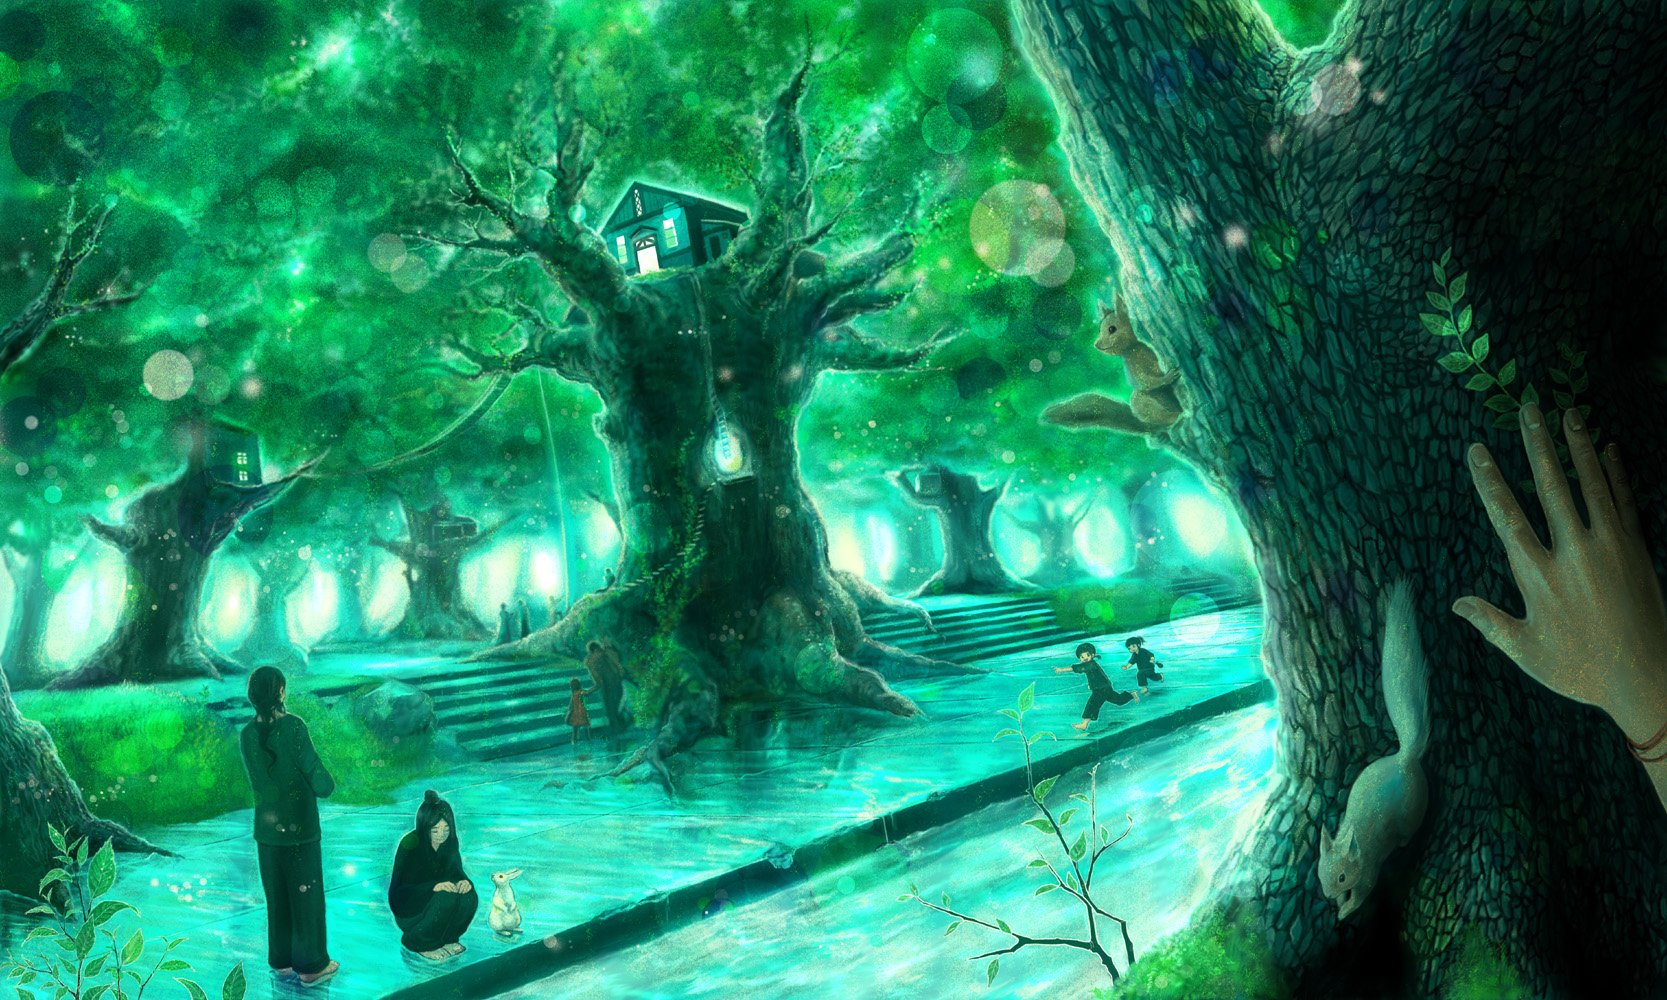 Download Anime Forest Wallpaper 1667x1000 Wallpoper 176751 1667x1000